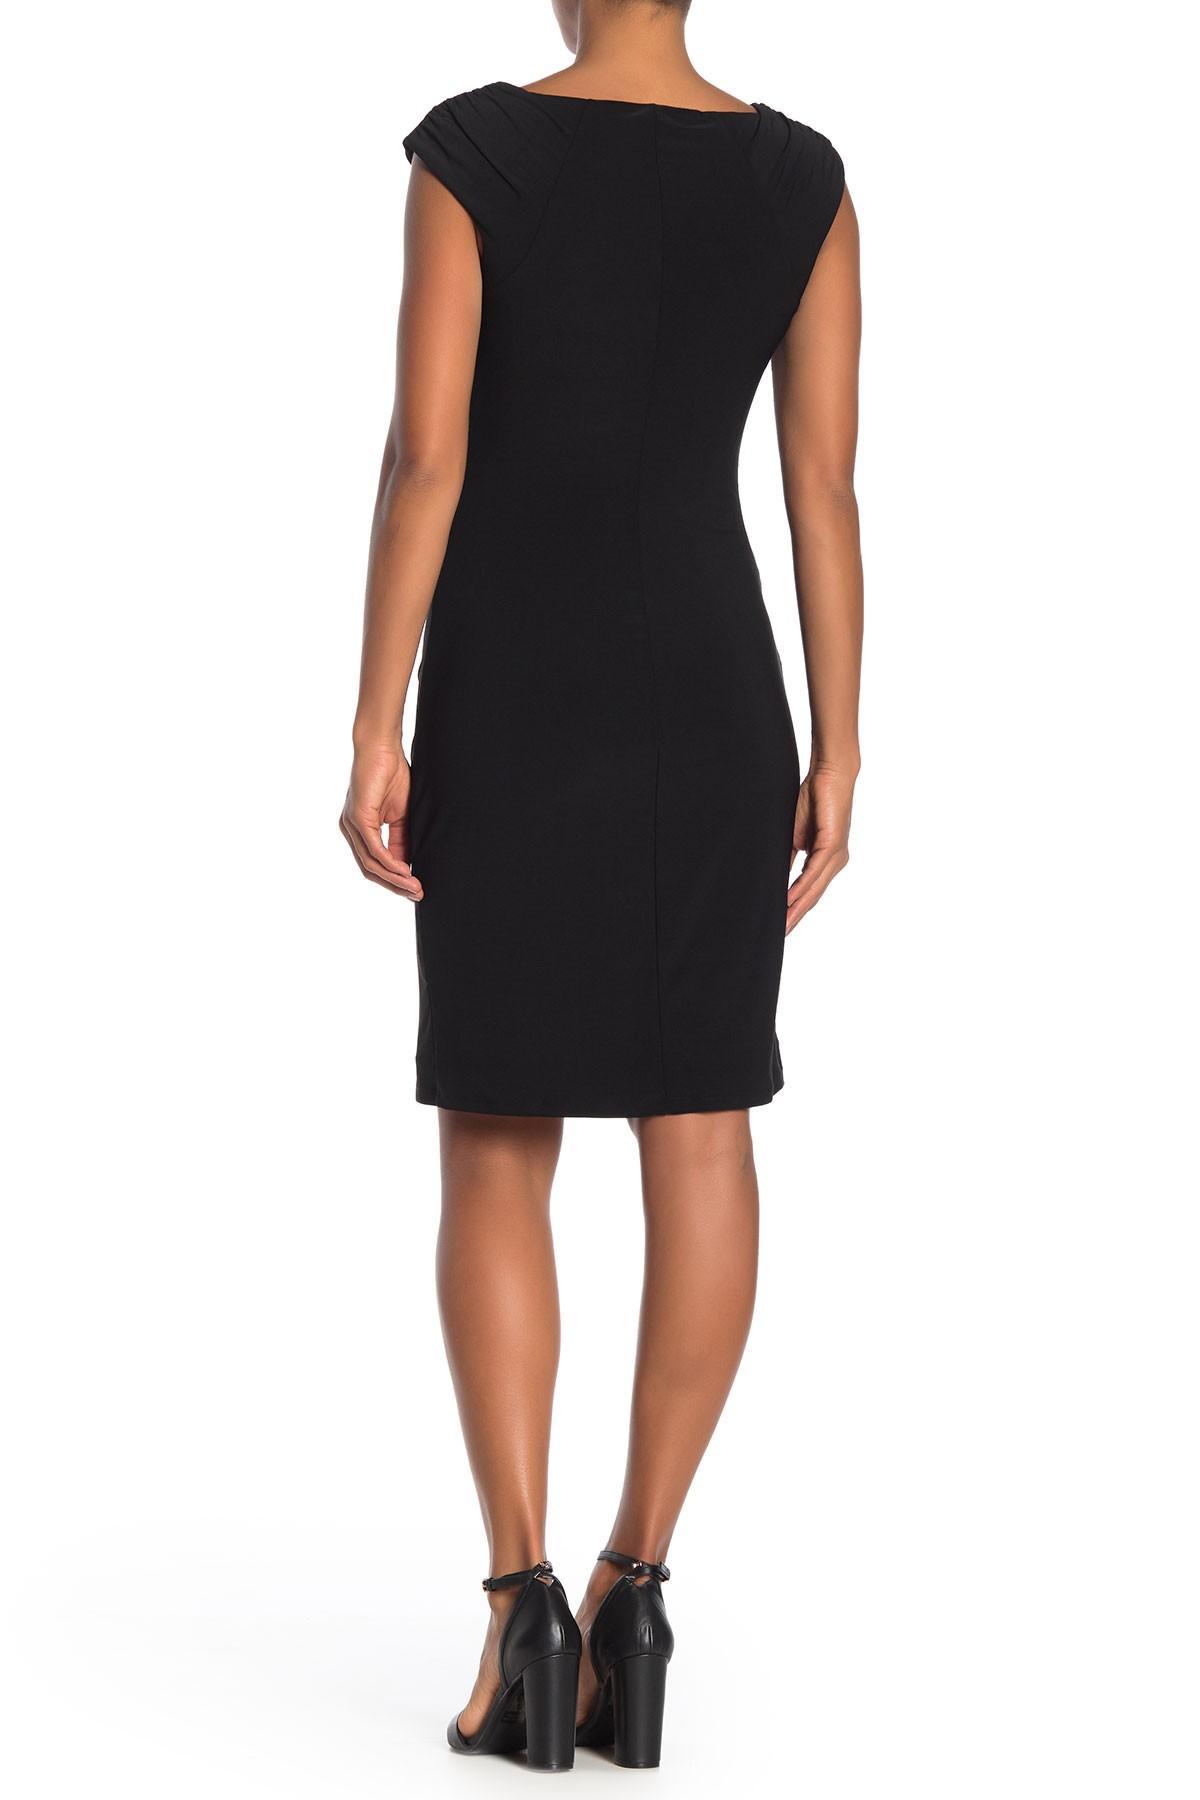 a32a7d5f7 Lyst - Catherine Malandrino Cap Sleeve Shirred Side Dress in Black